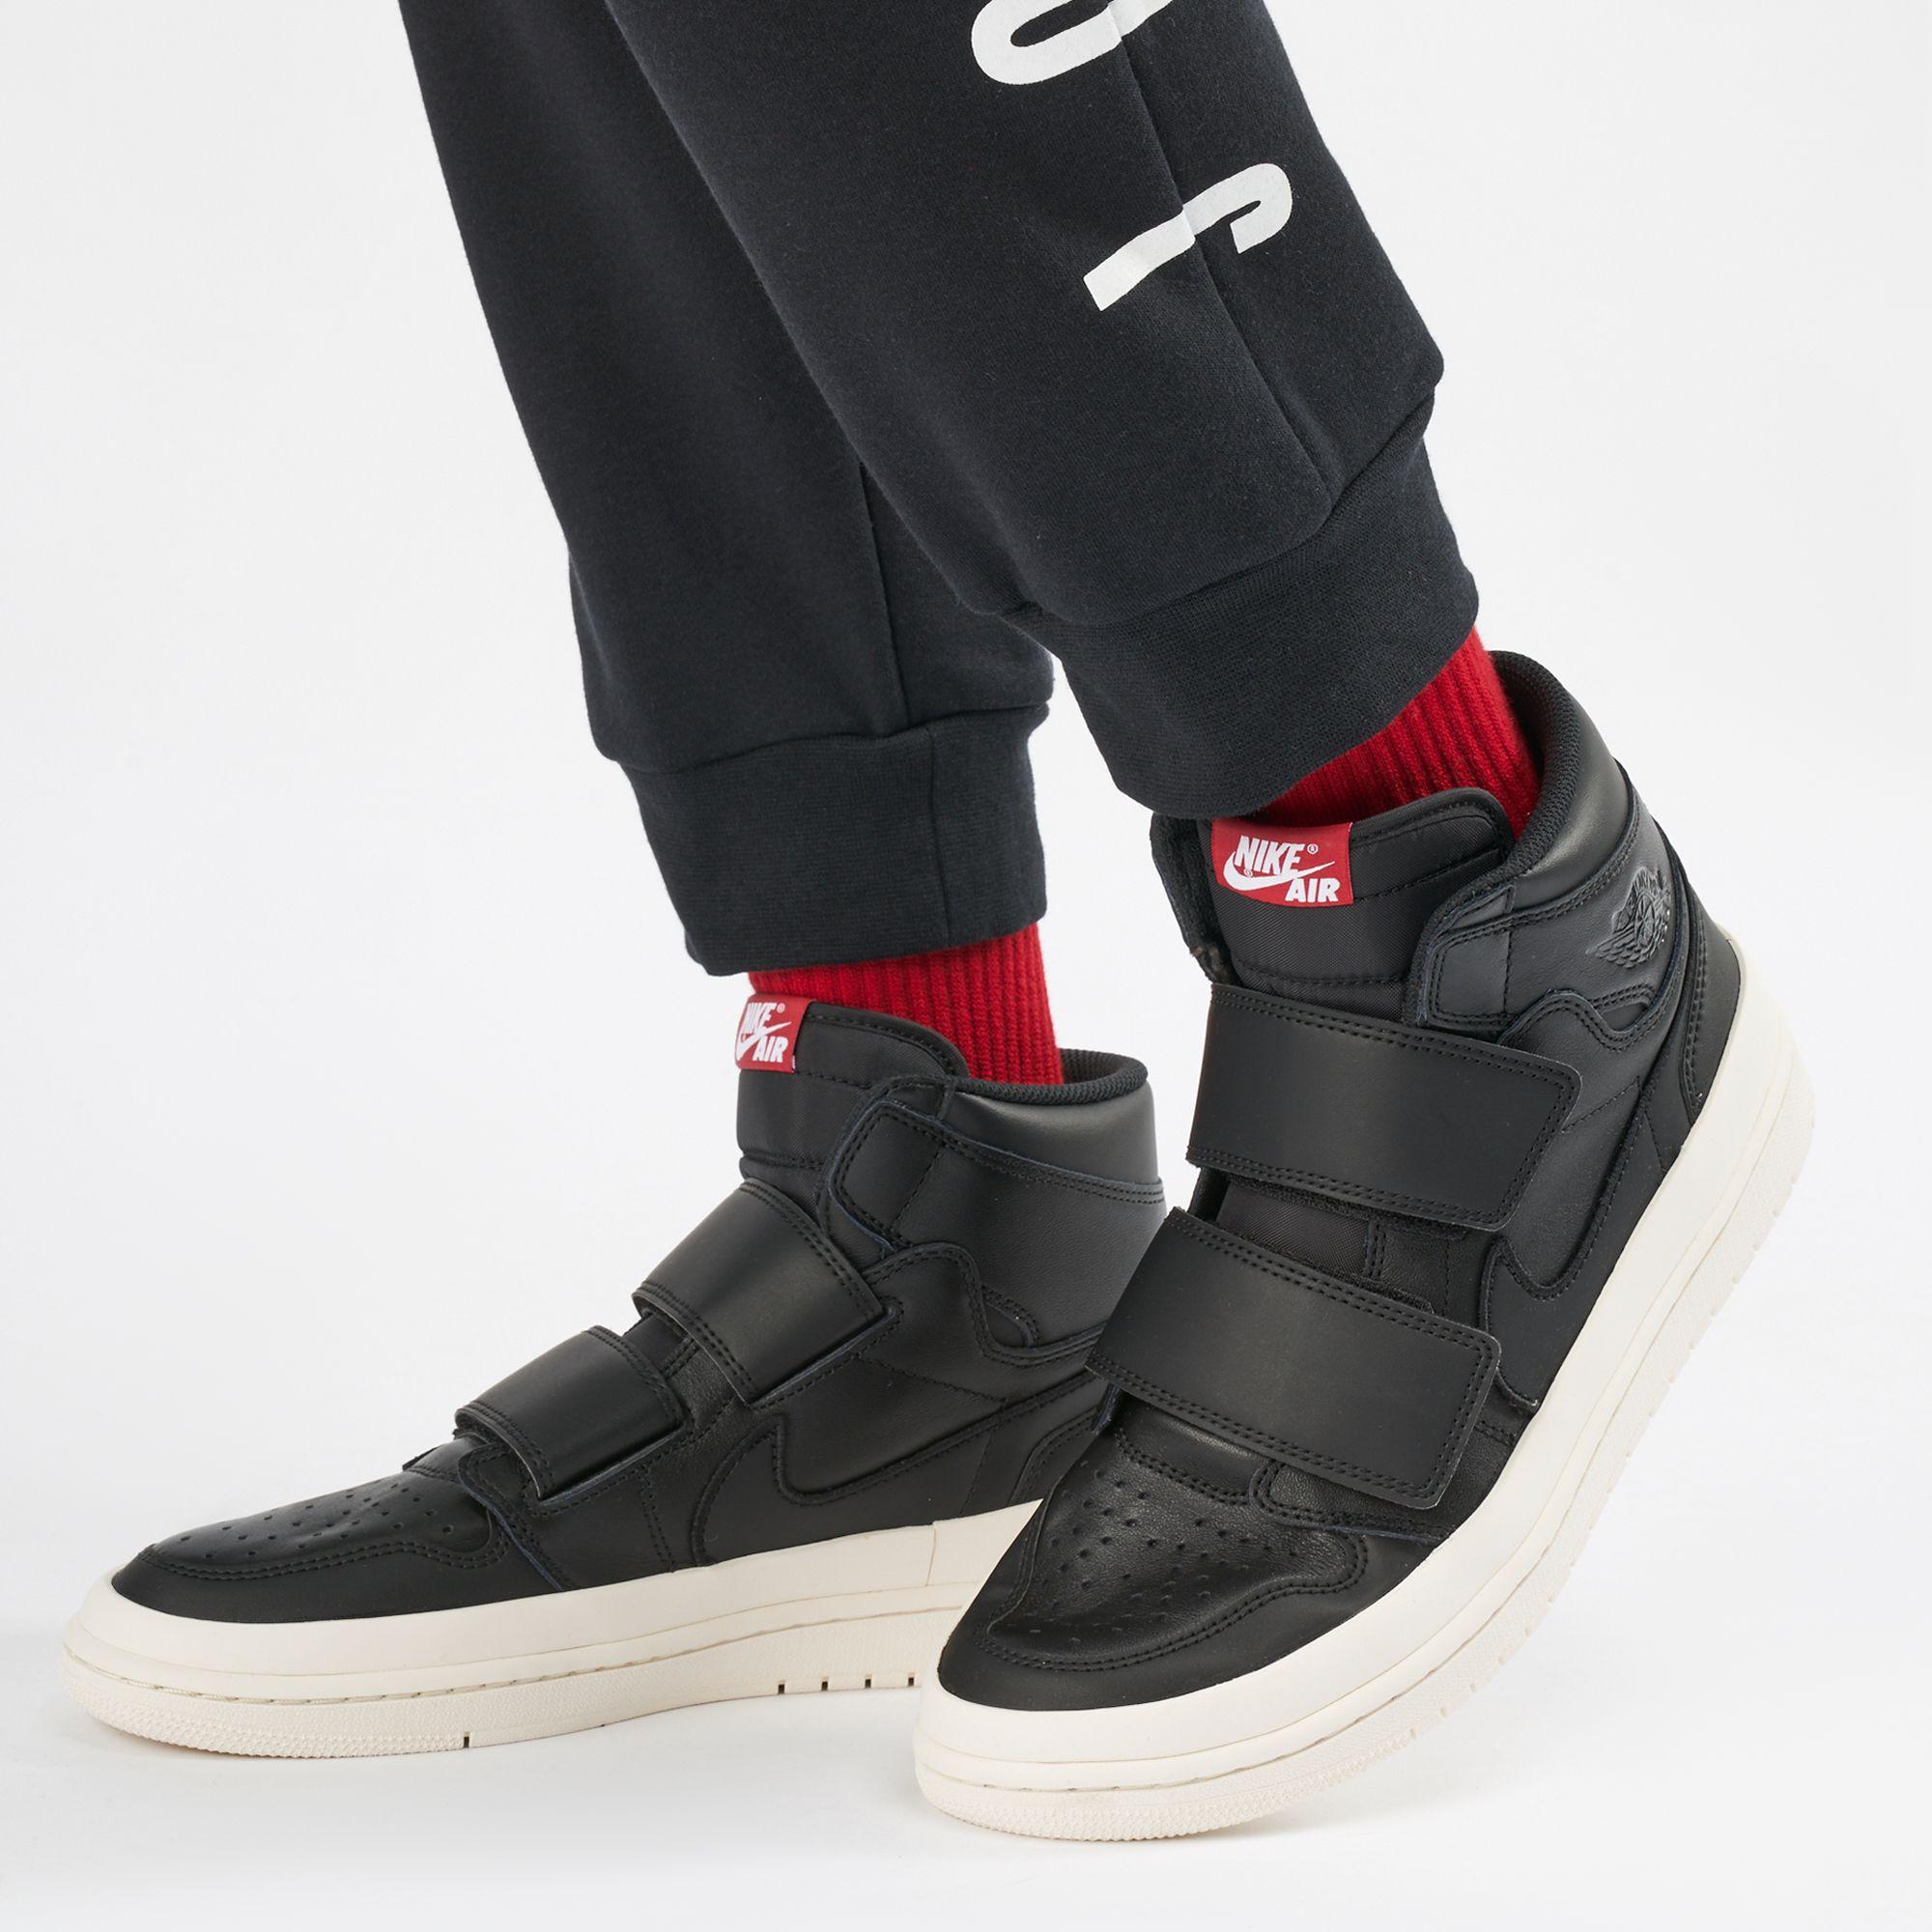 8bf86a24033f Jordan Air Jordan 1 Retro High Double Strap Shoe